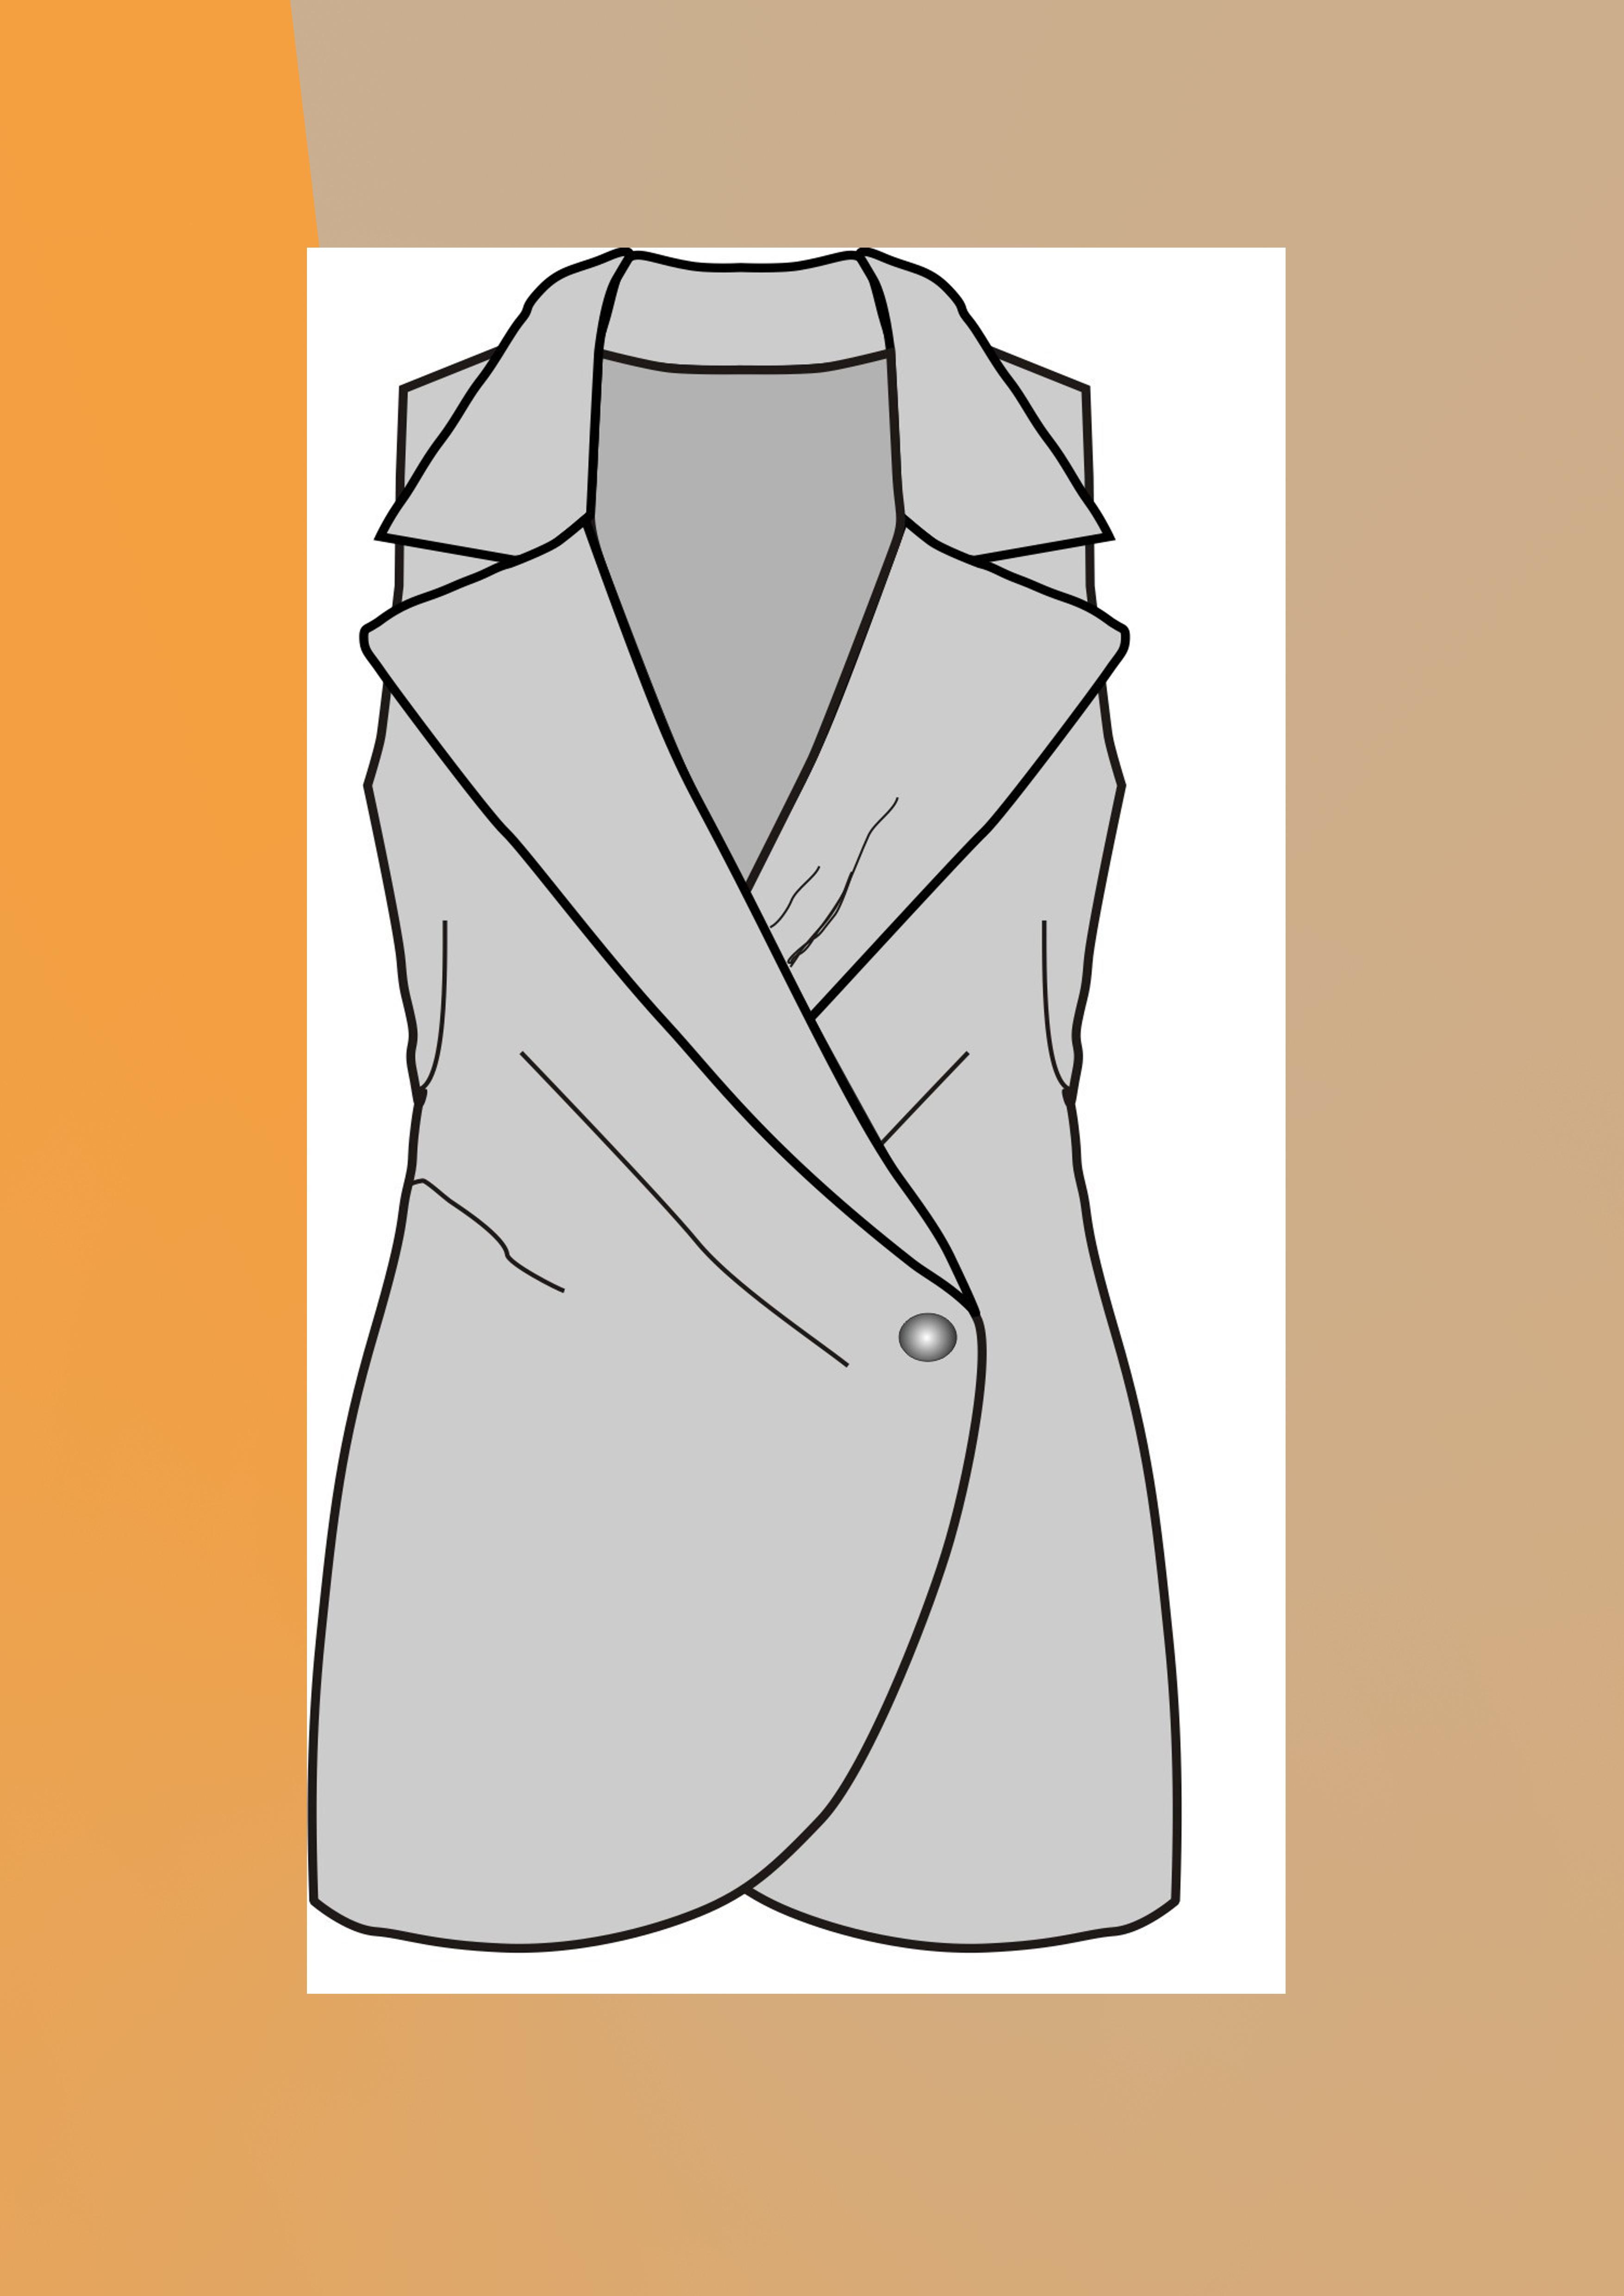 Bluz, Elbise, Ceket, Kaban, Mont (Üst Grup) Model Çizimleri